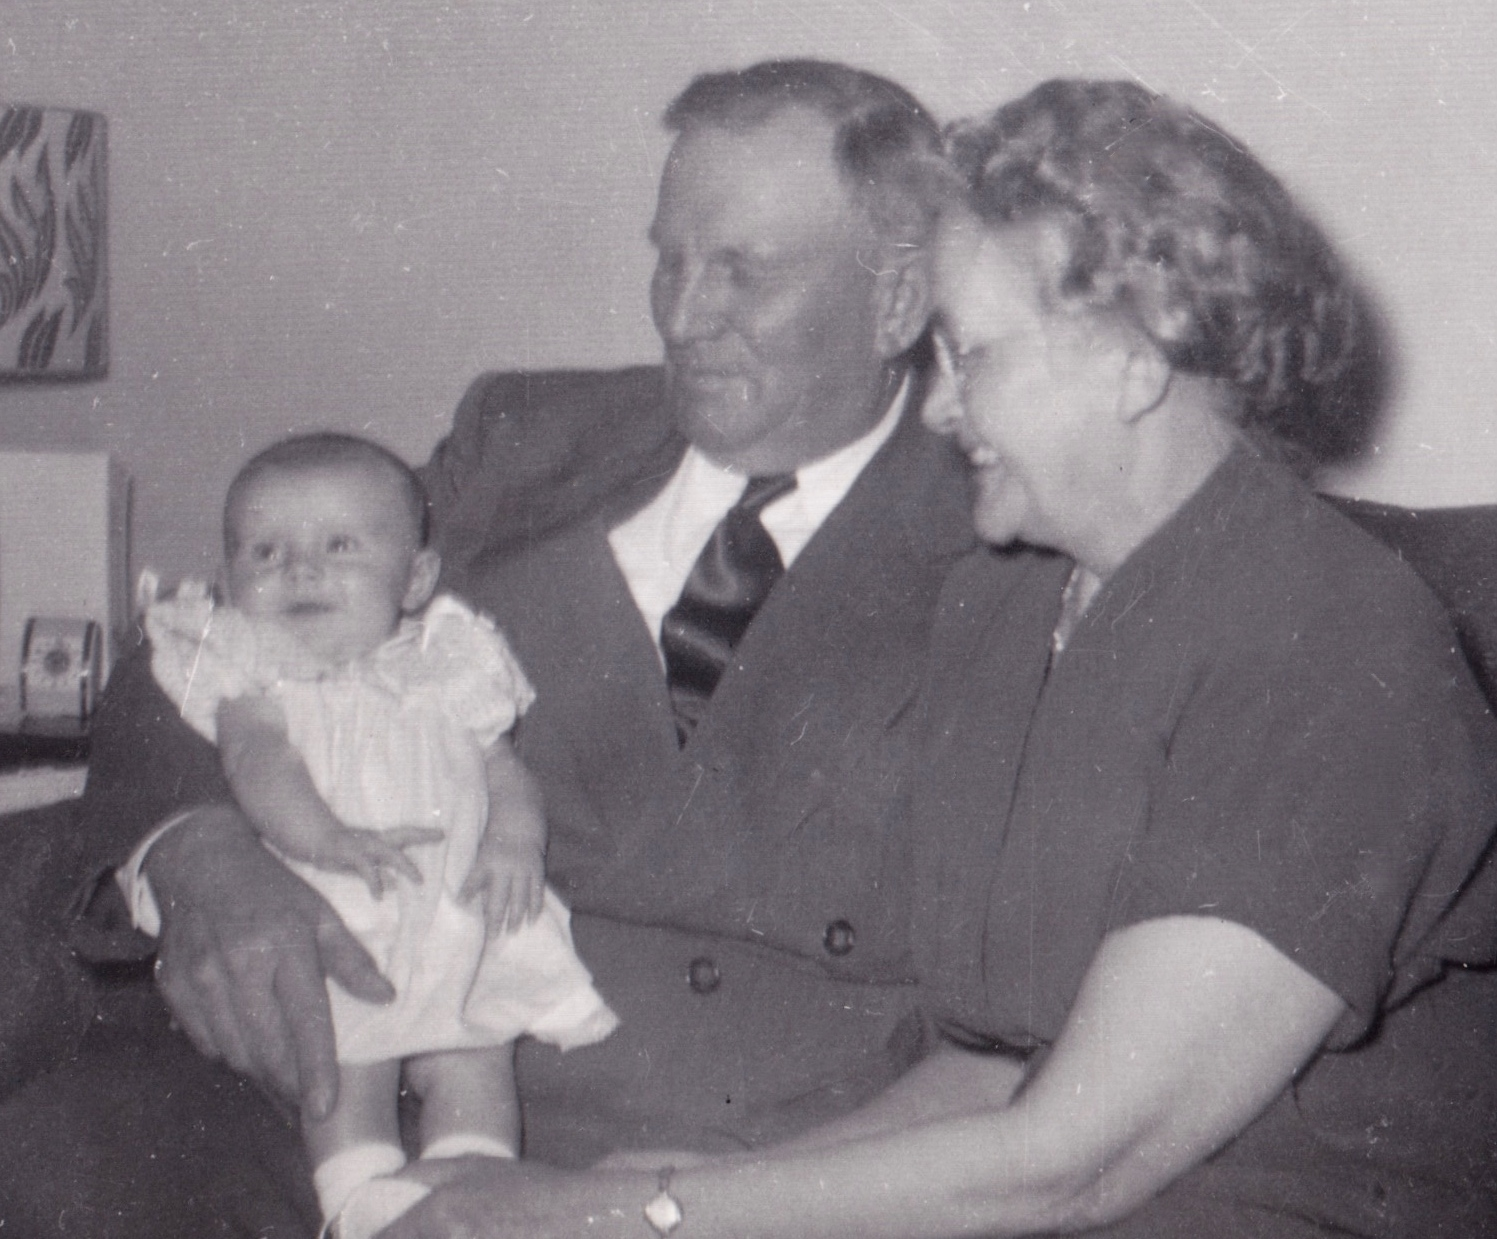 Remembering My Grandpa What Next